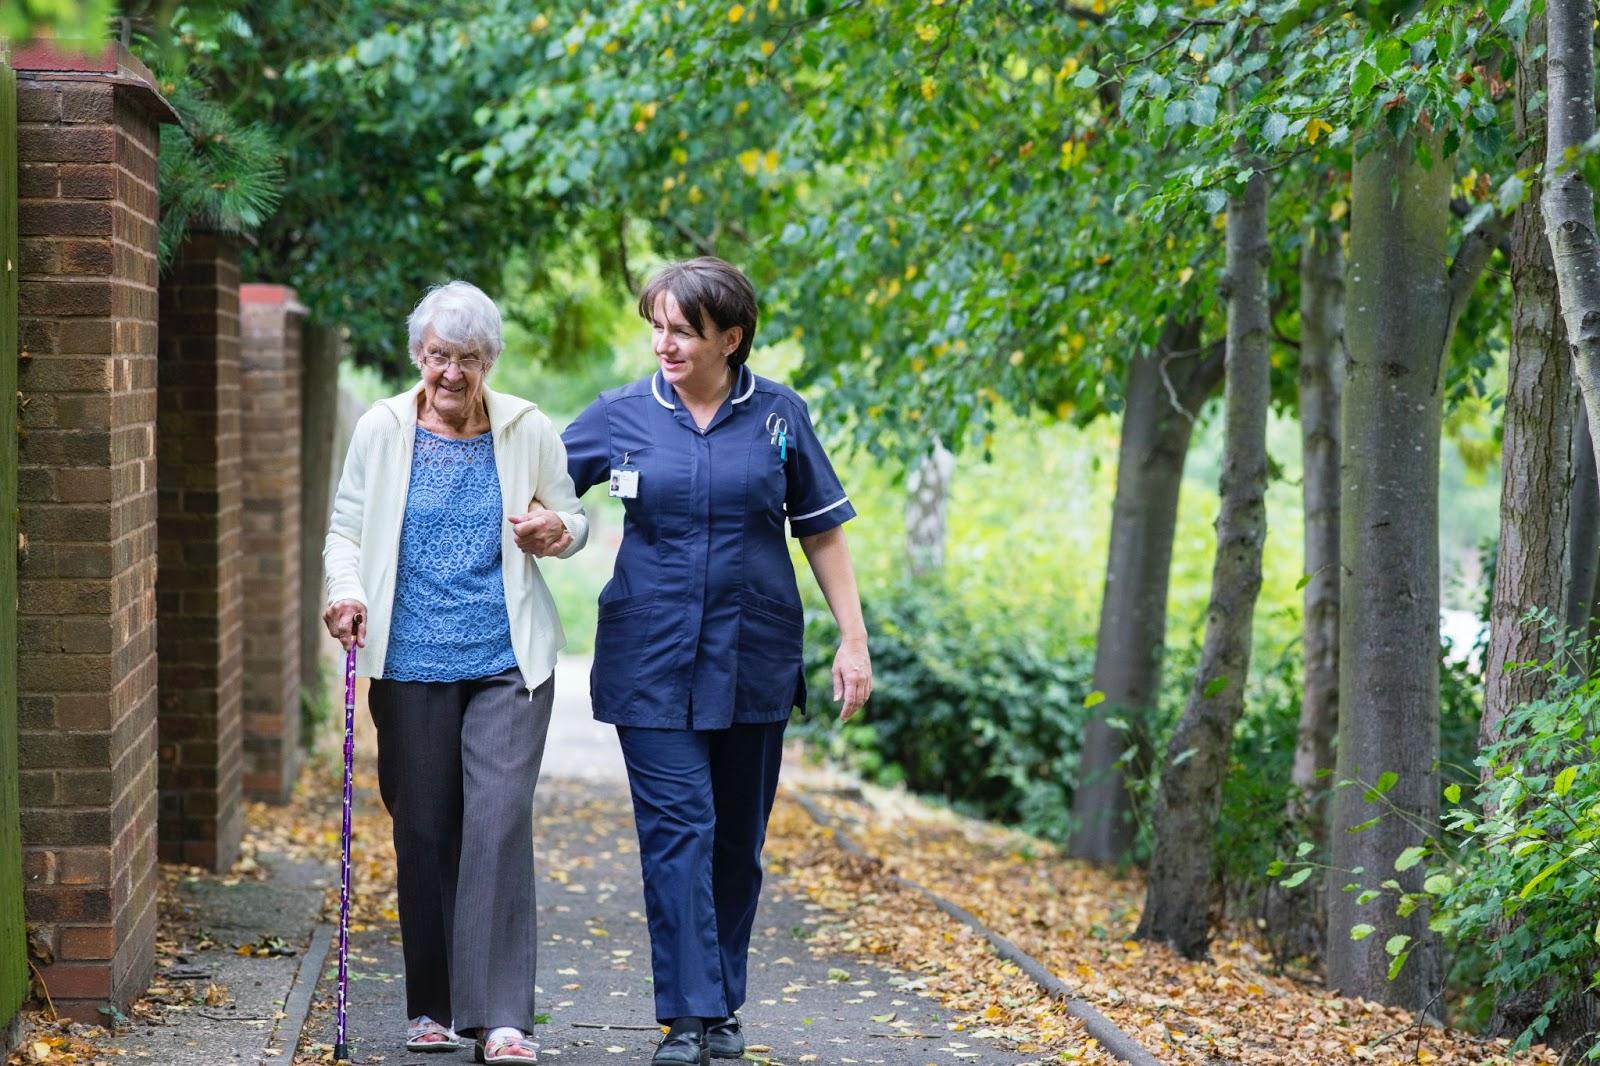 Caretaker walking with senior citizen